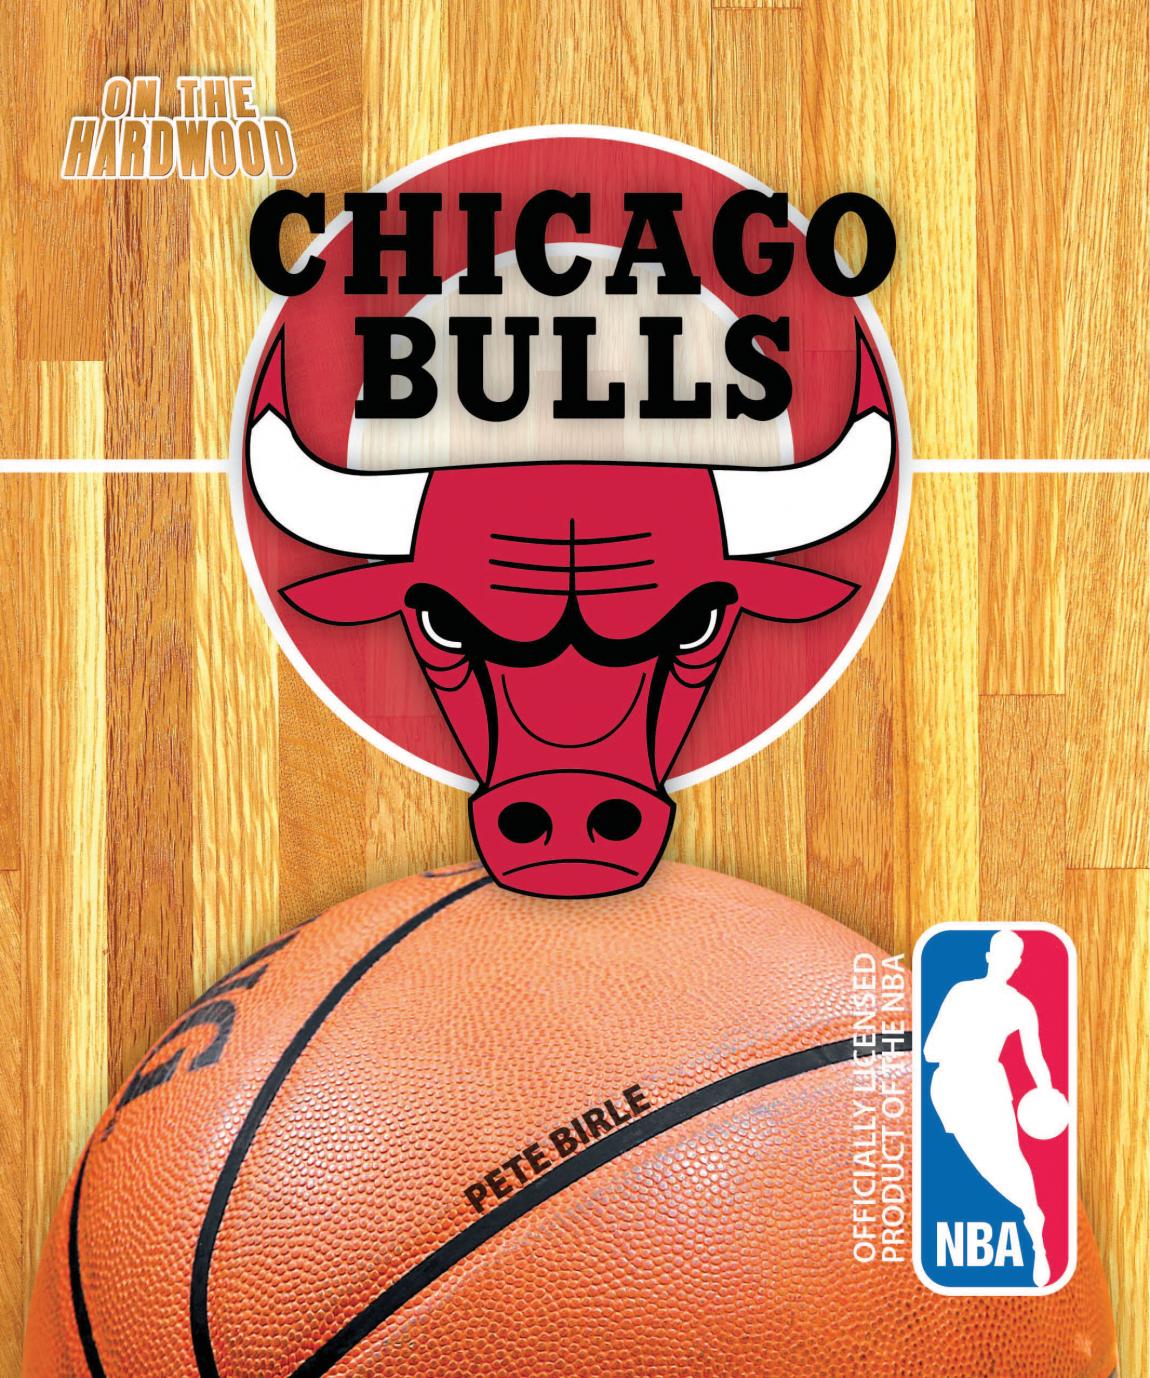 Bulls-1.png